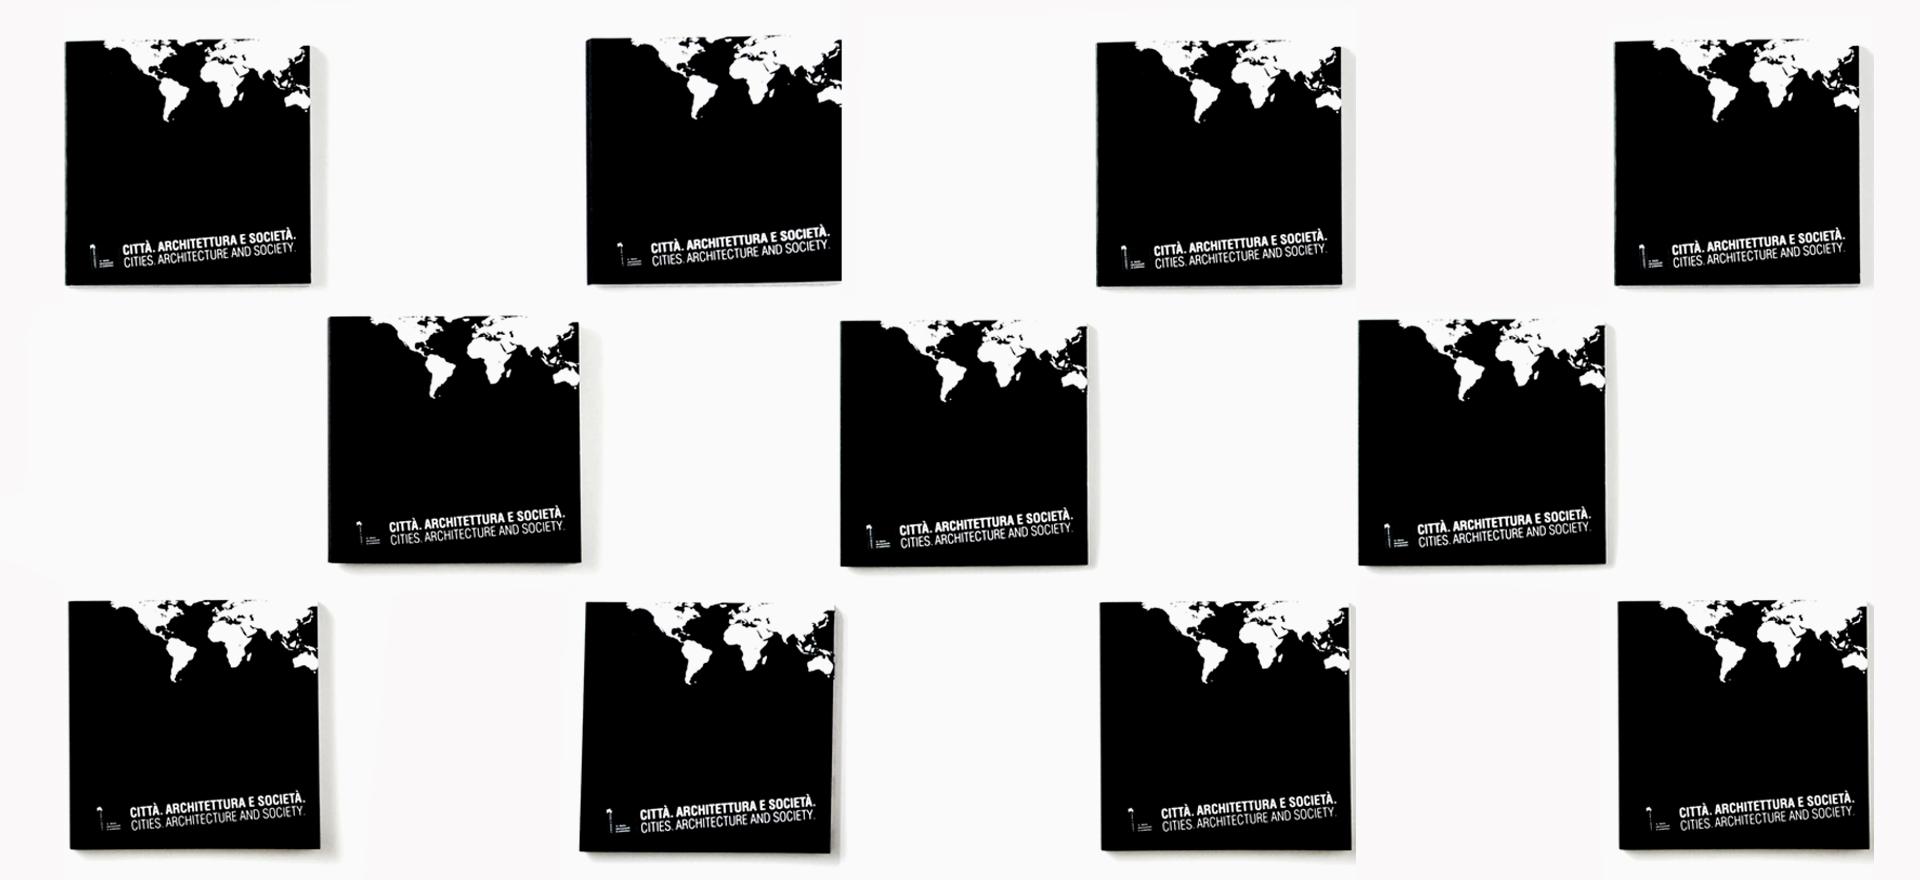 La Biennale di Venezia | Urban Design | Catalogues | Cities as models of sustainability | Mario Trimarchi Design | Fragile 3